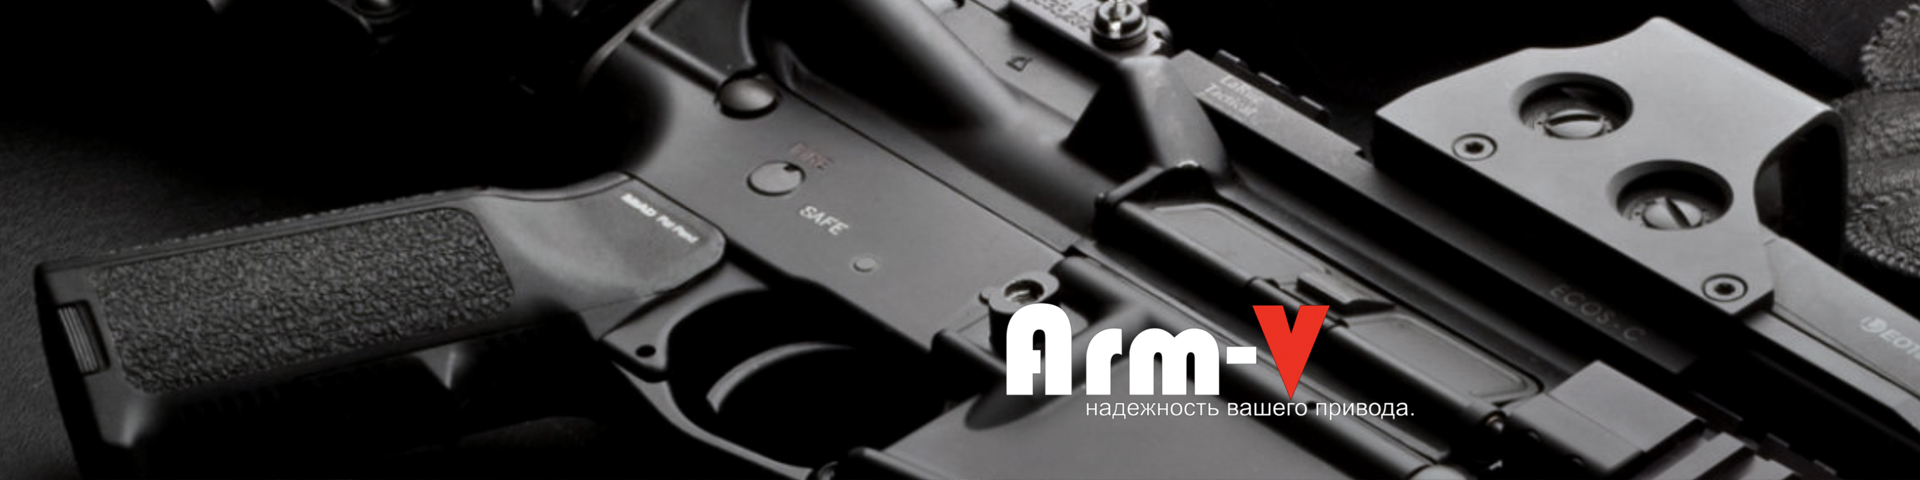 ARM-V